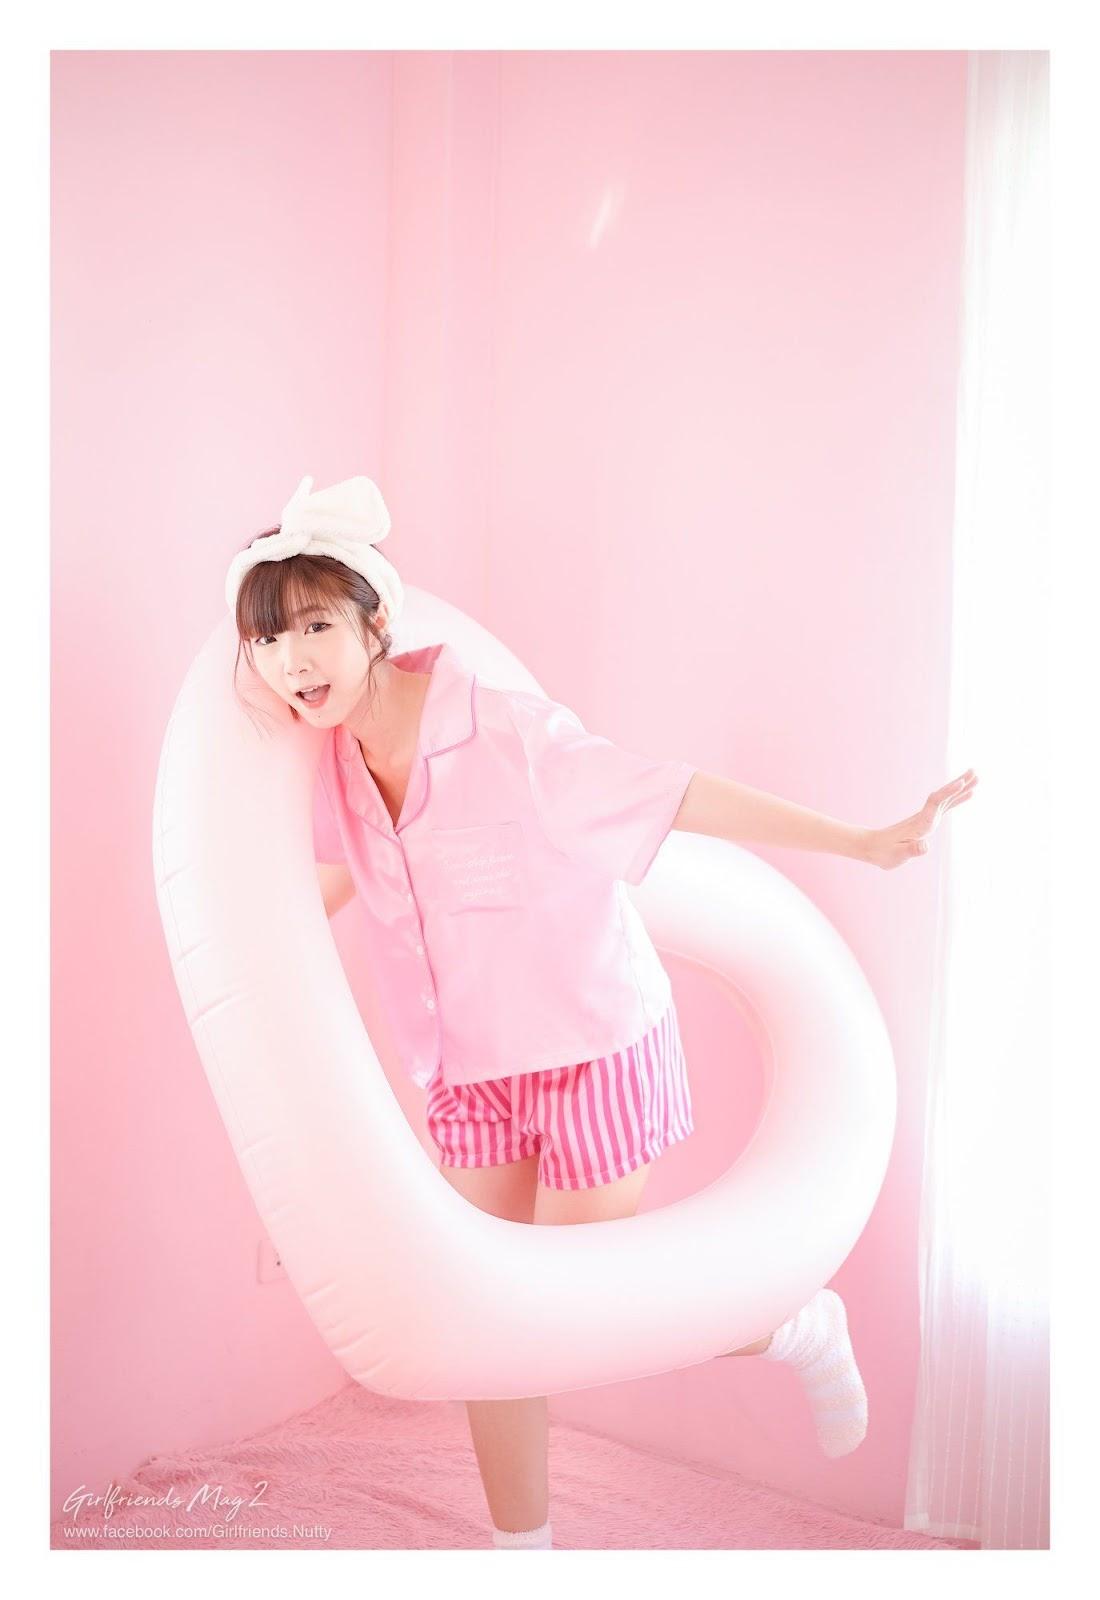 Image Thailand Model - Pakkhagee Arkornpattanakul - Pink Tone - TruePic.net - Picture-7